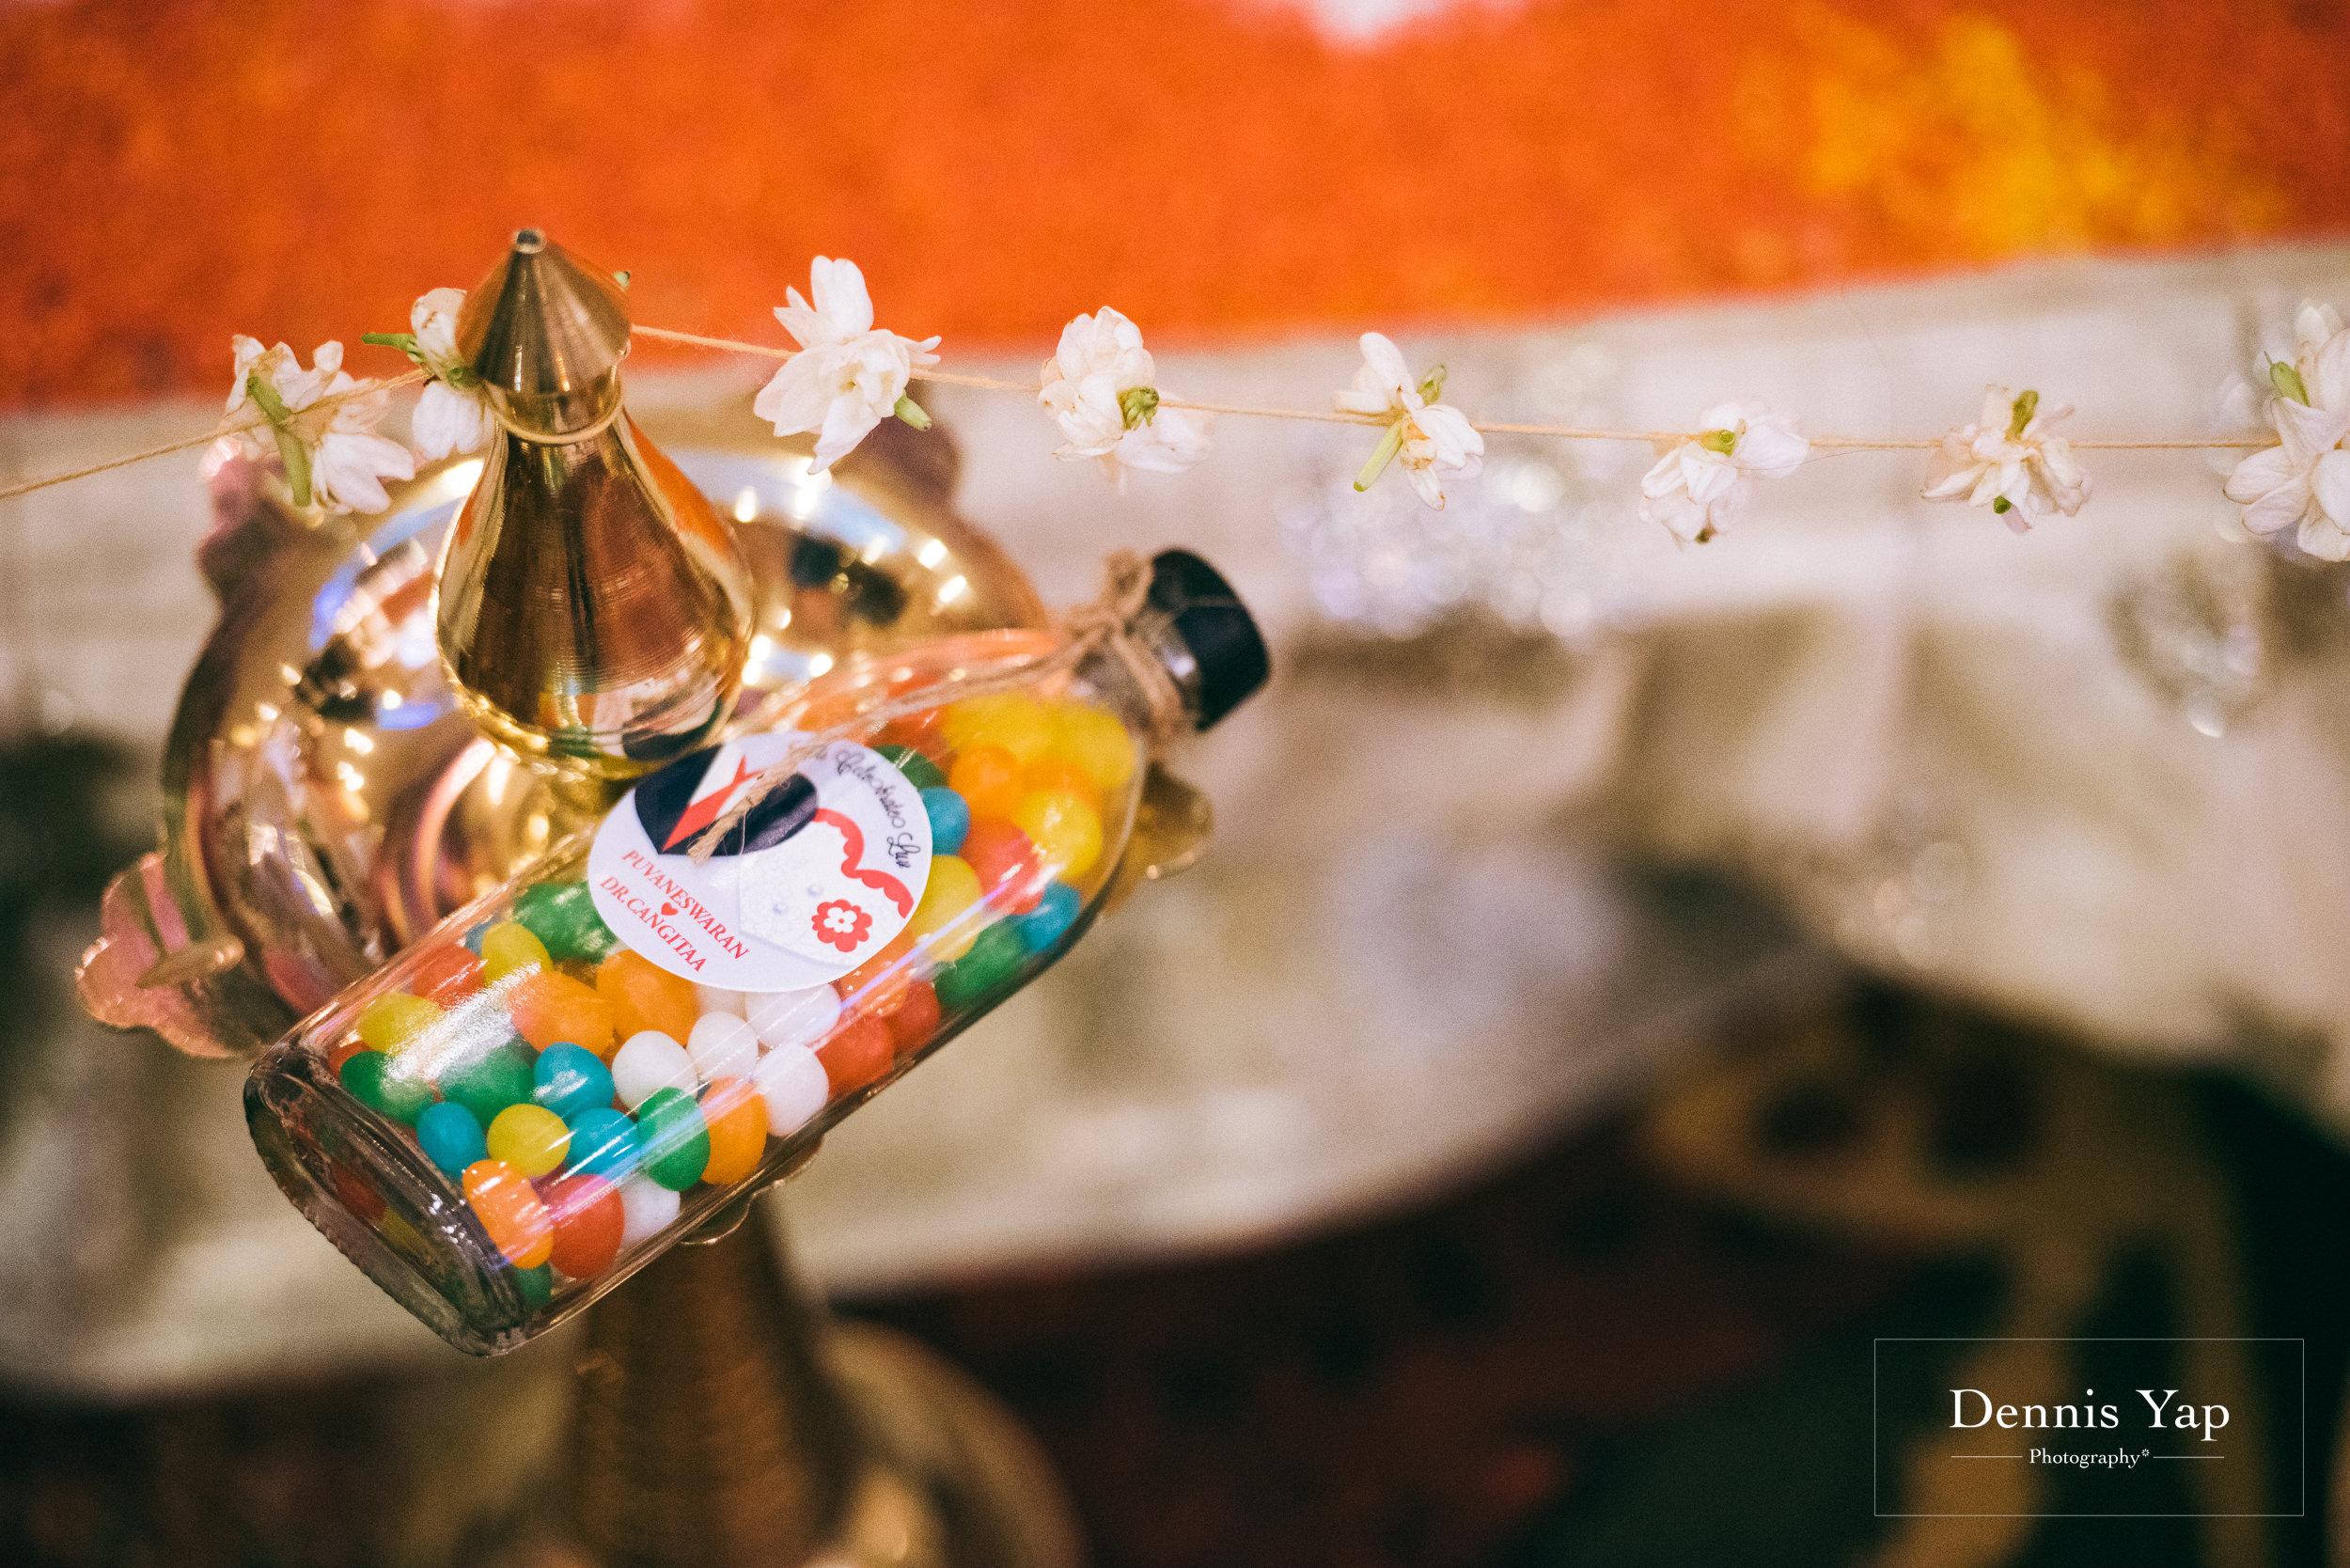 puvaneswaran cangitaa indian wedding ceremony ideal convention dennis yap photography malaysia-4.jpg